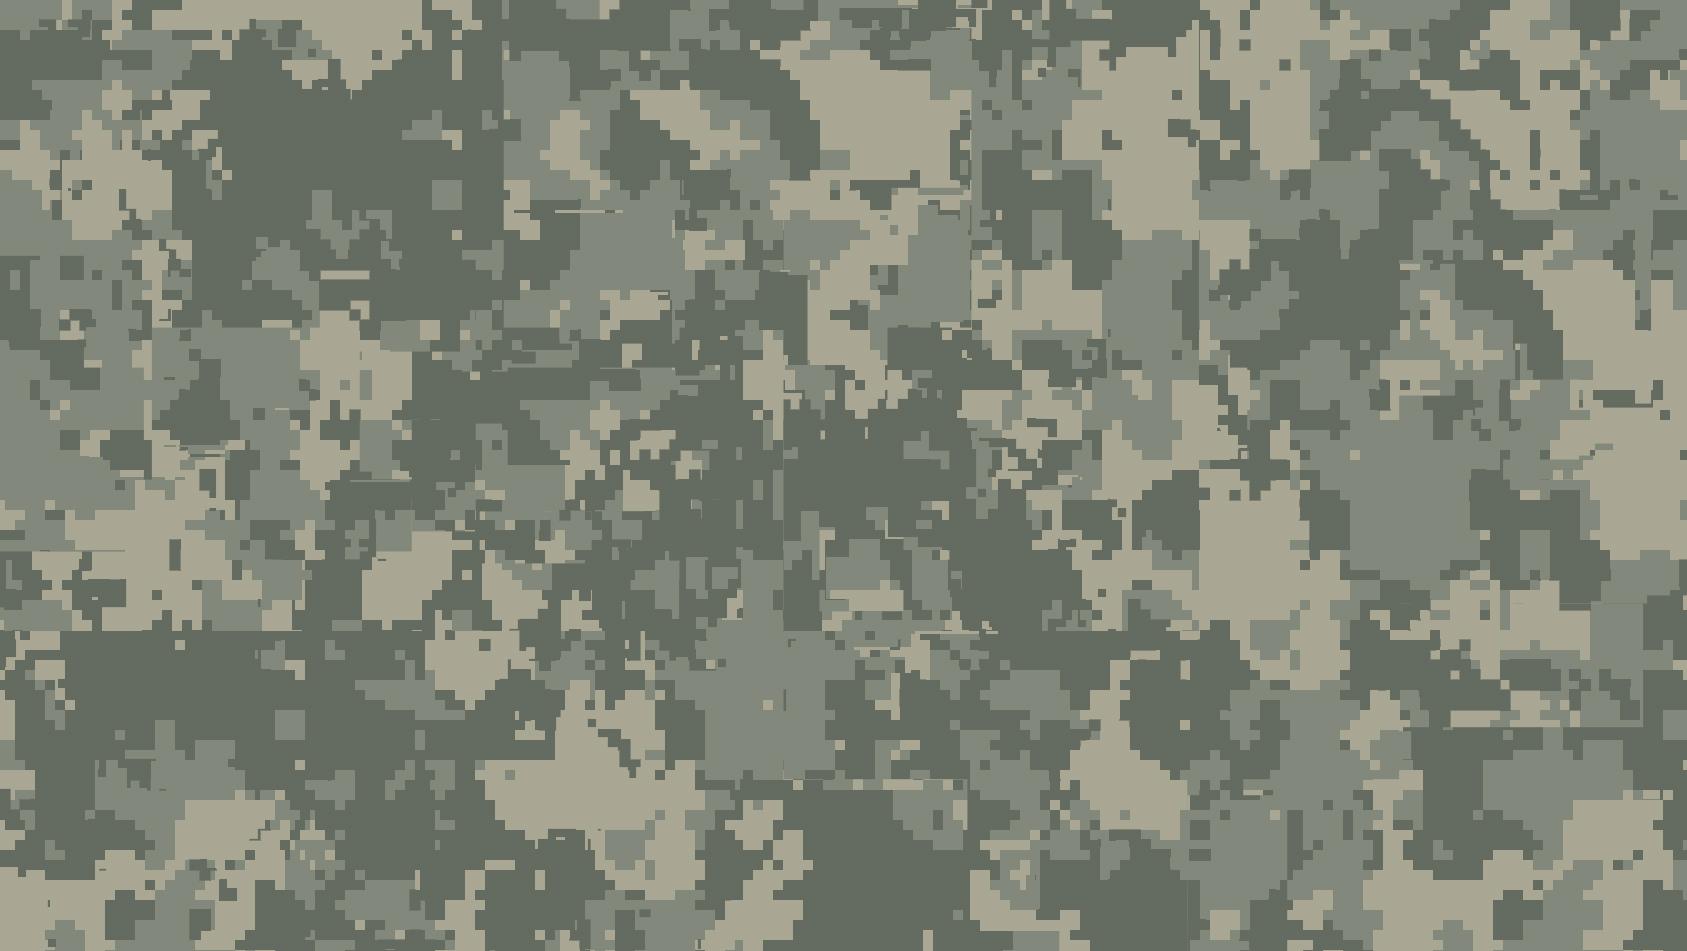 Digital Camo Backgrounds 1687x951